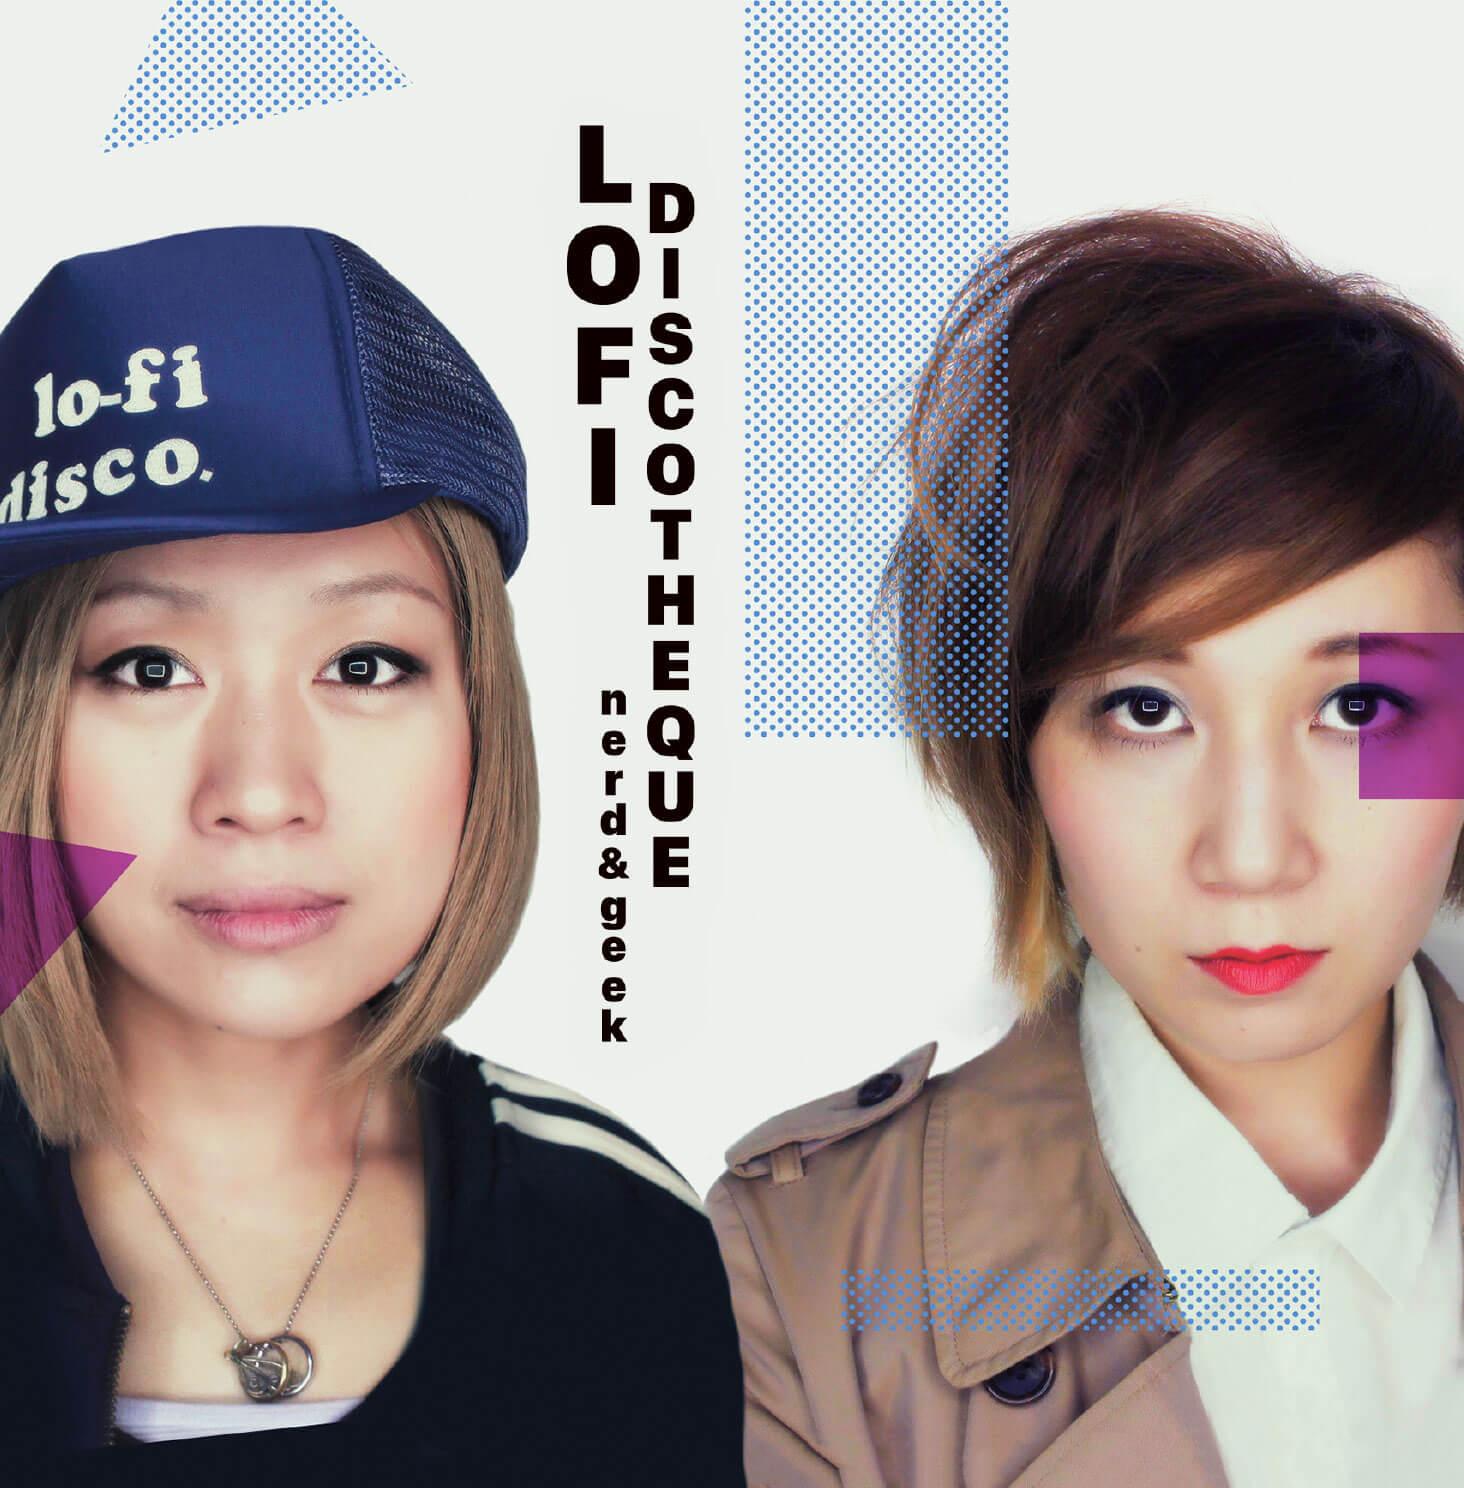 The first album of Lo-Fi Discotheque, Nerd & Geek